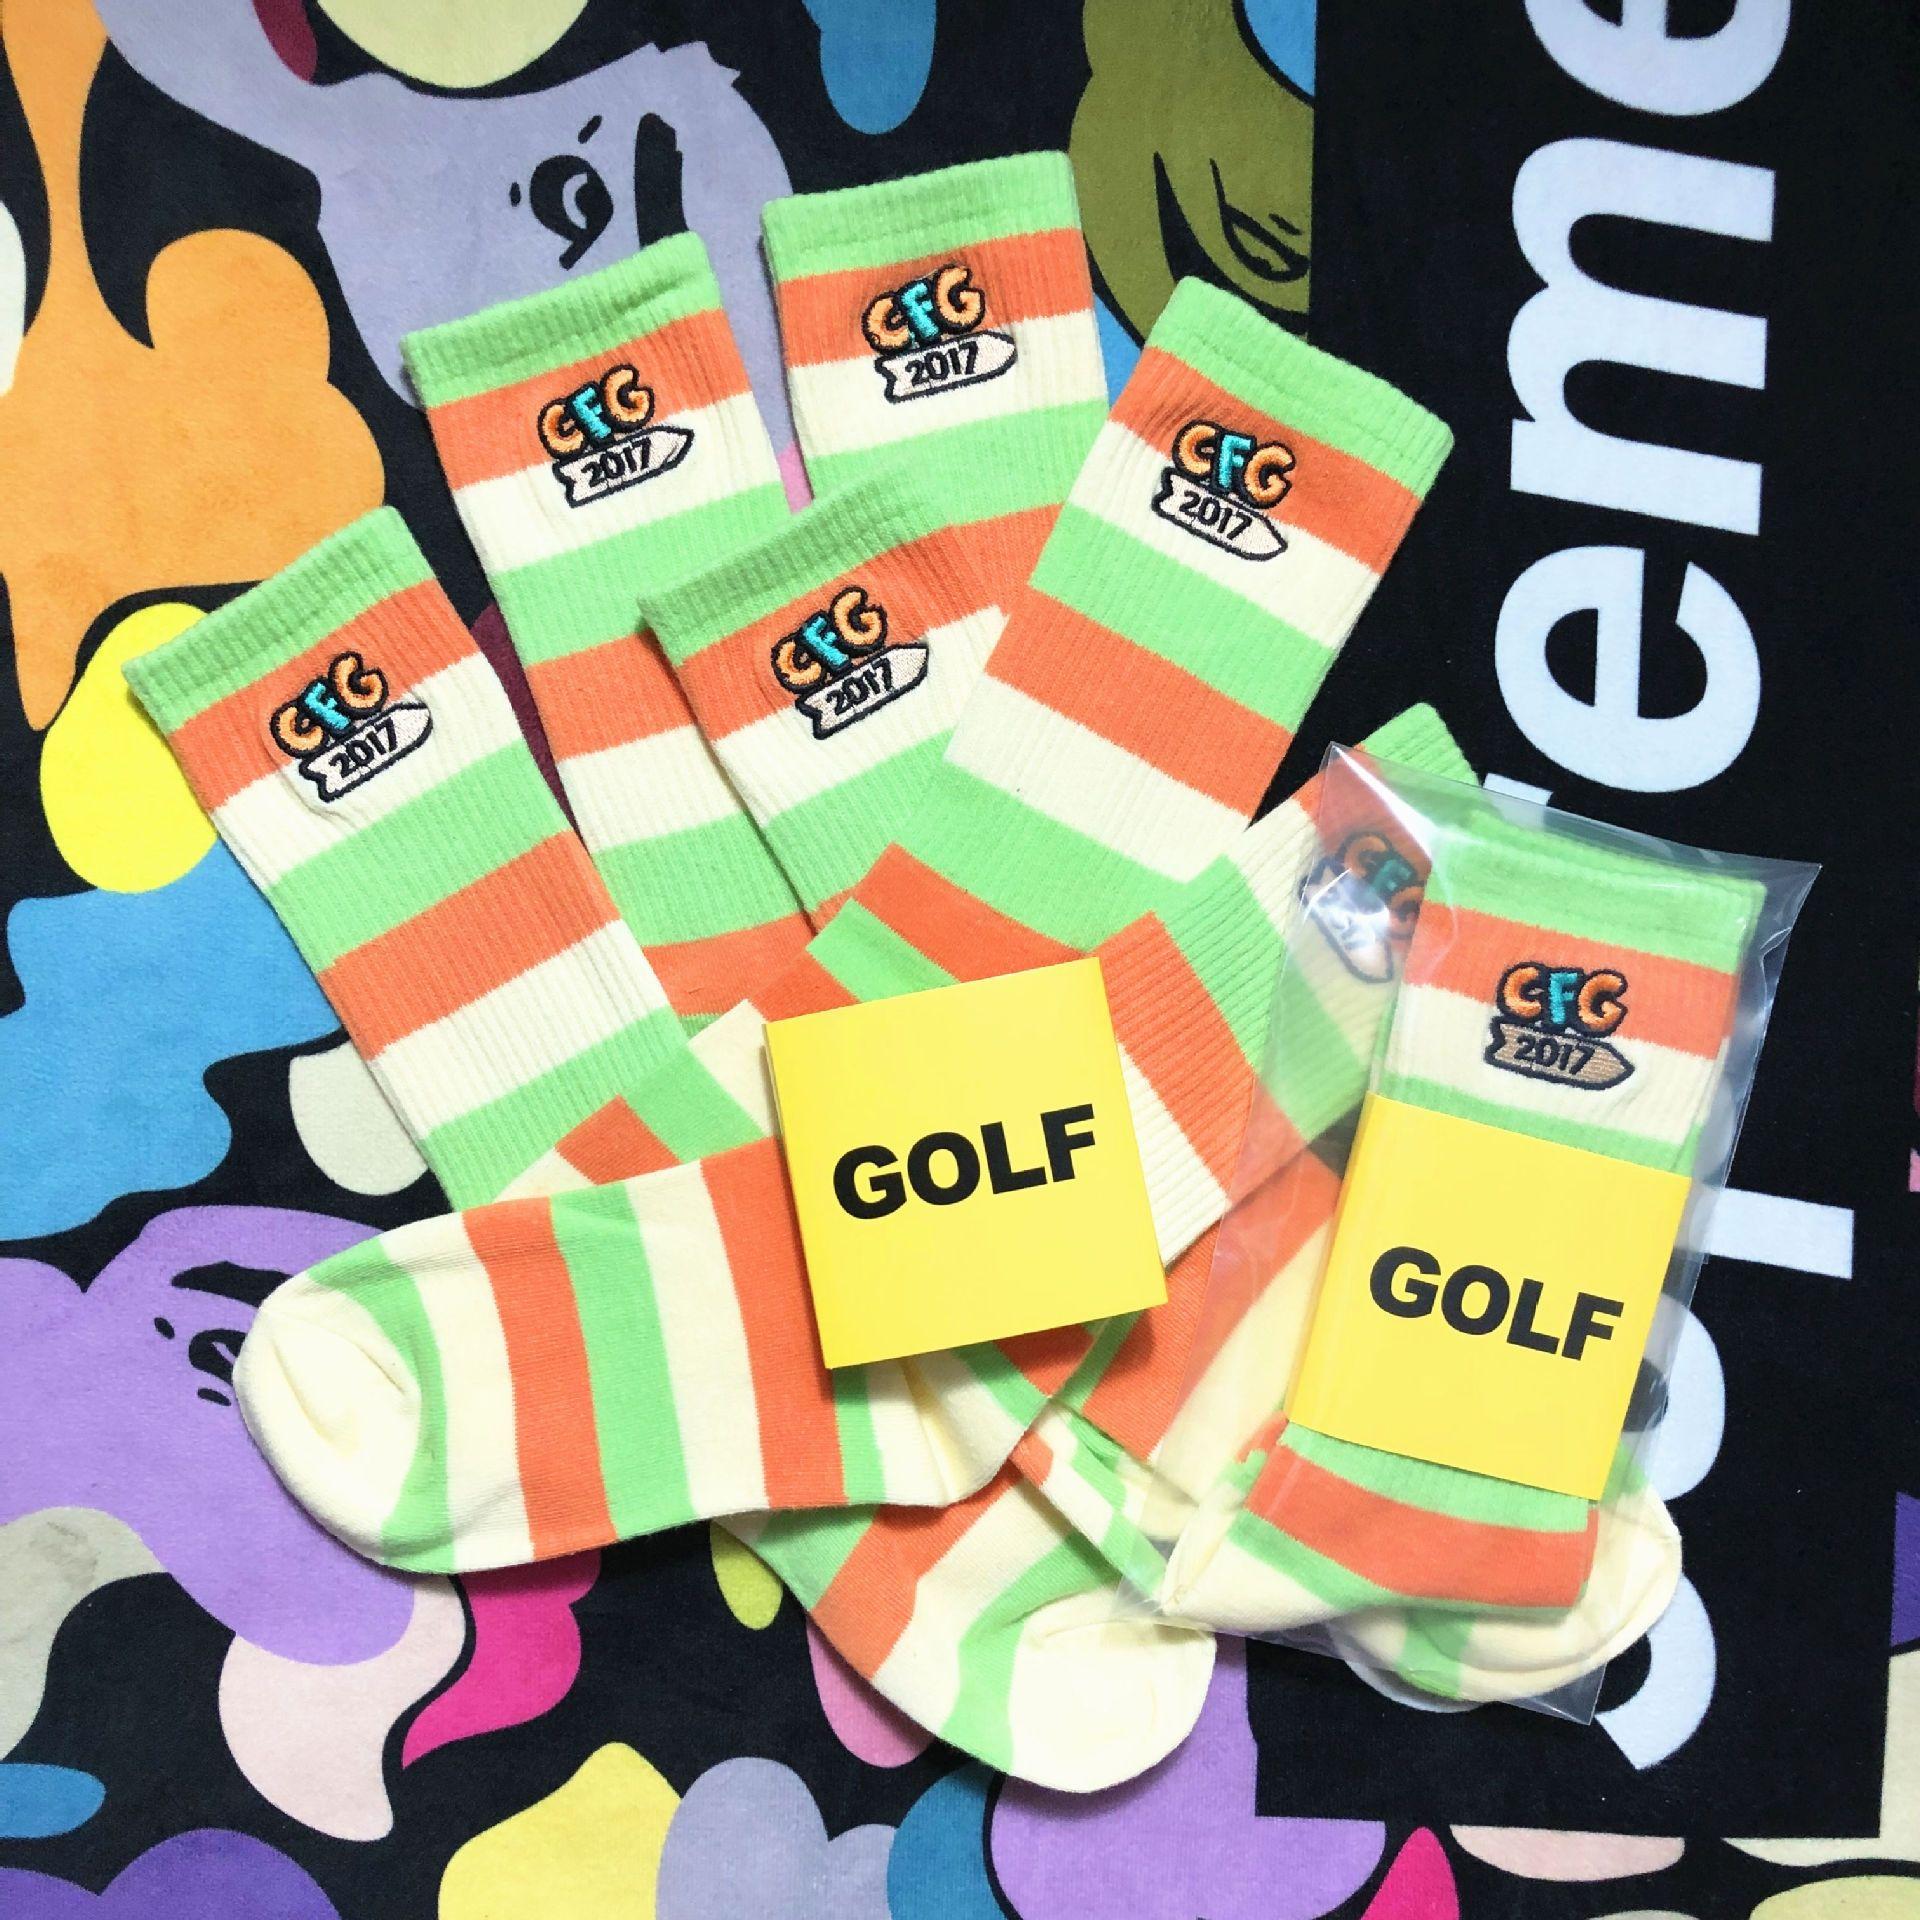 medias bordadas Moda HIN7a medias festival de música golfWANG marca bordado limita algodón puro elegante estilo hip hop Calle amor